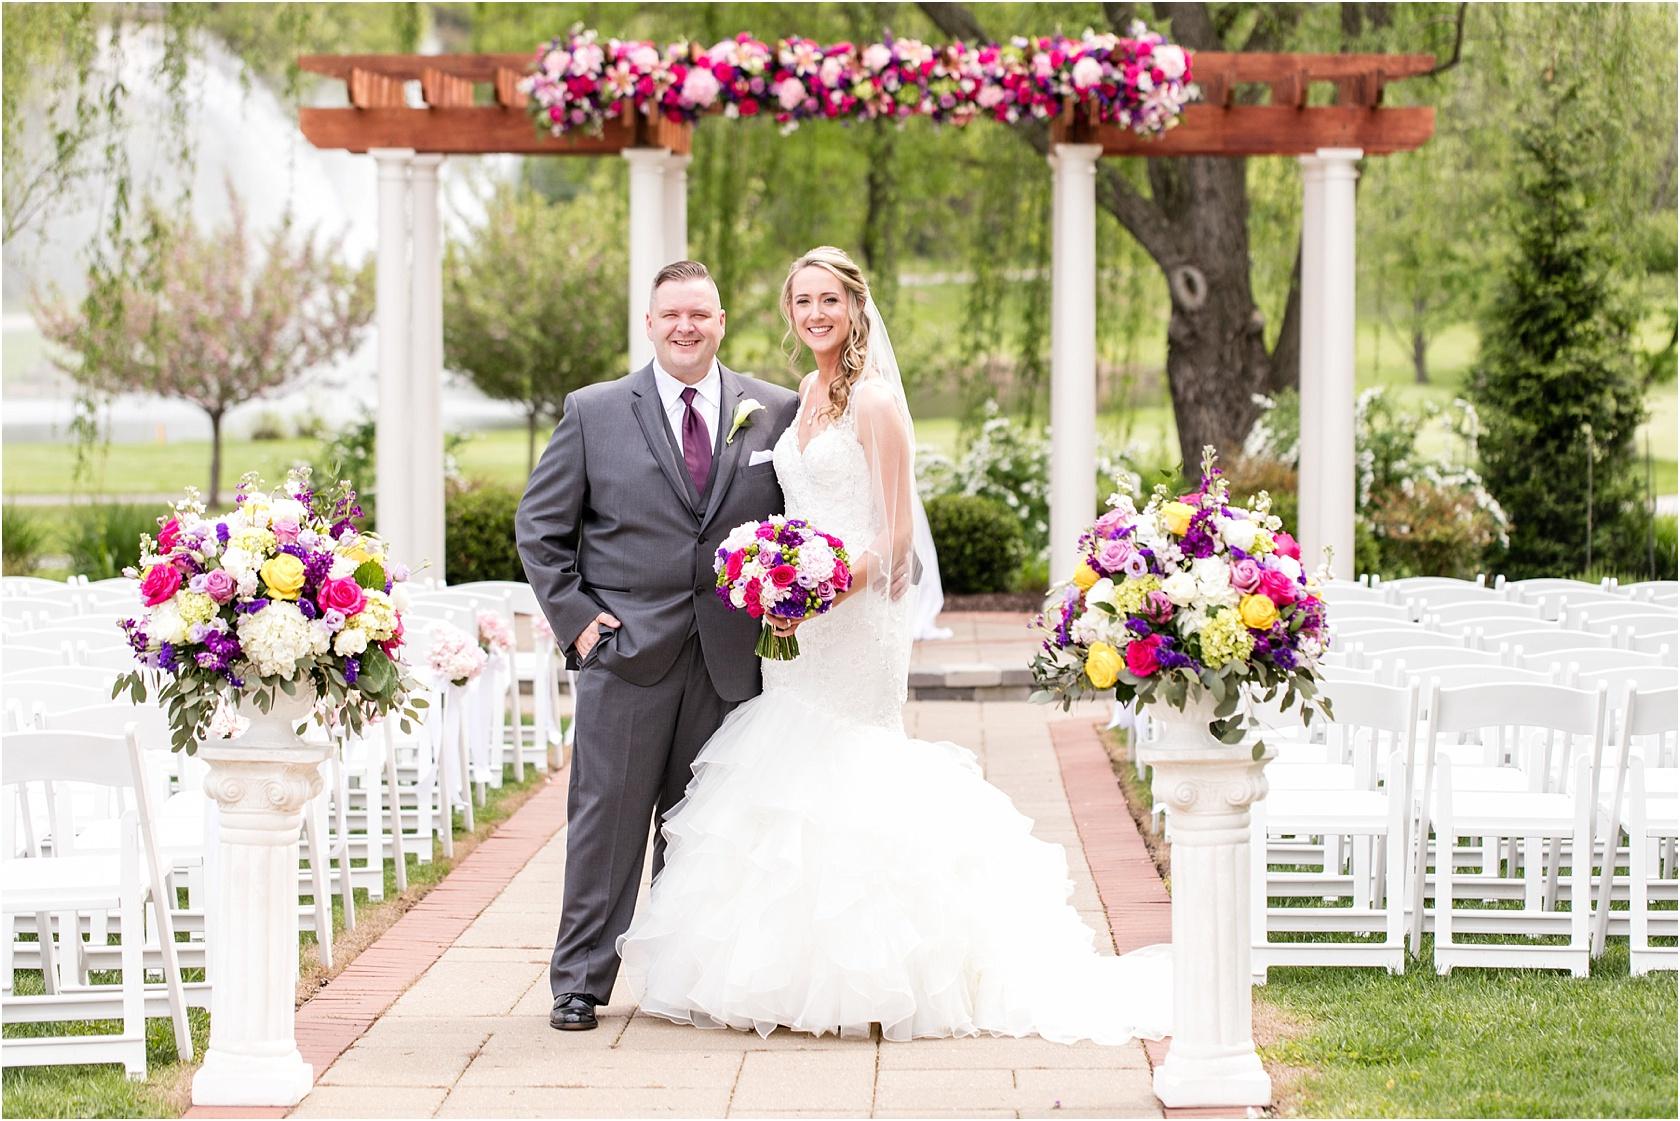 Sagal Wedding Turf Valley Resort Wedding Living Radiant Photography_0022.jpg